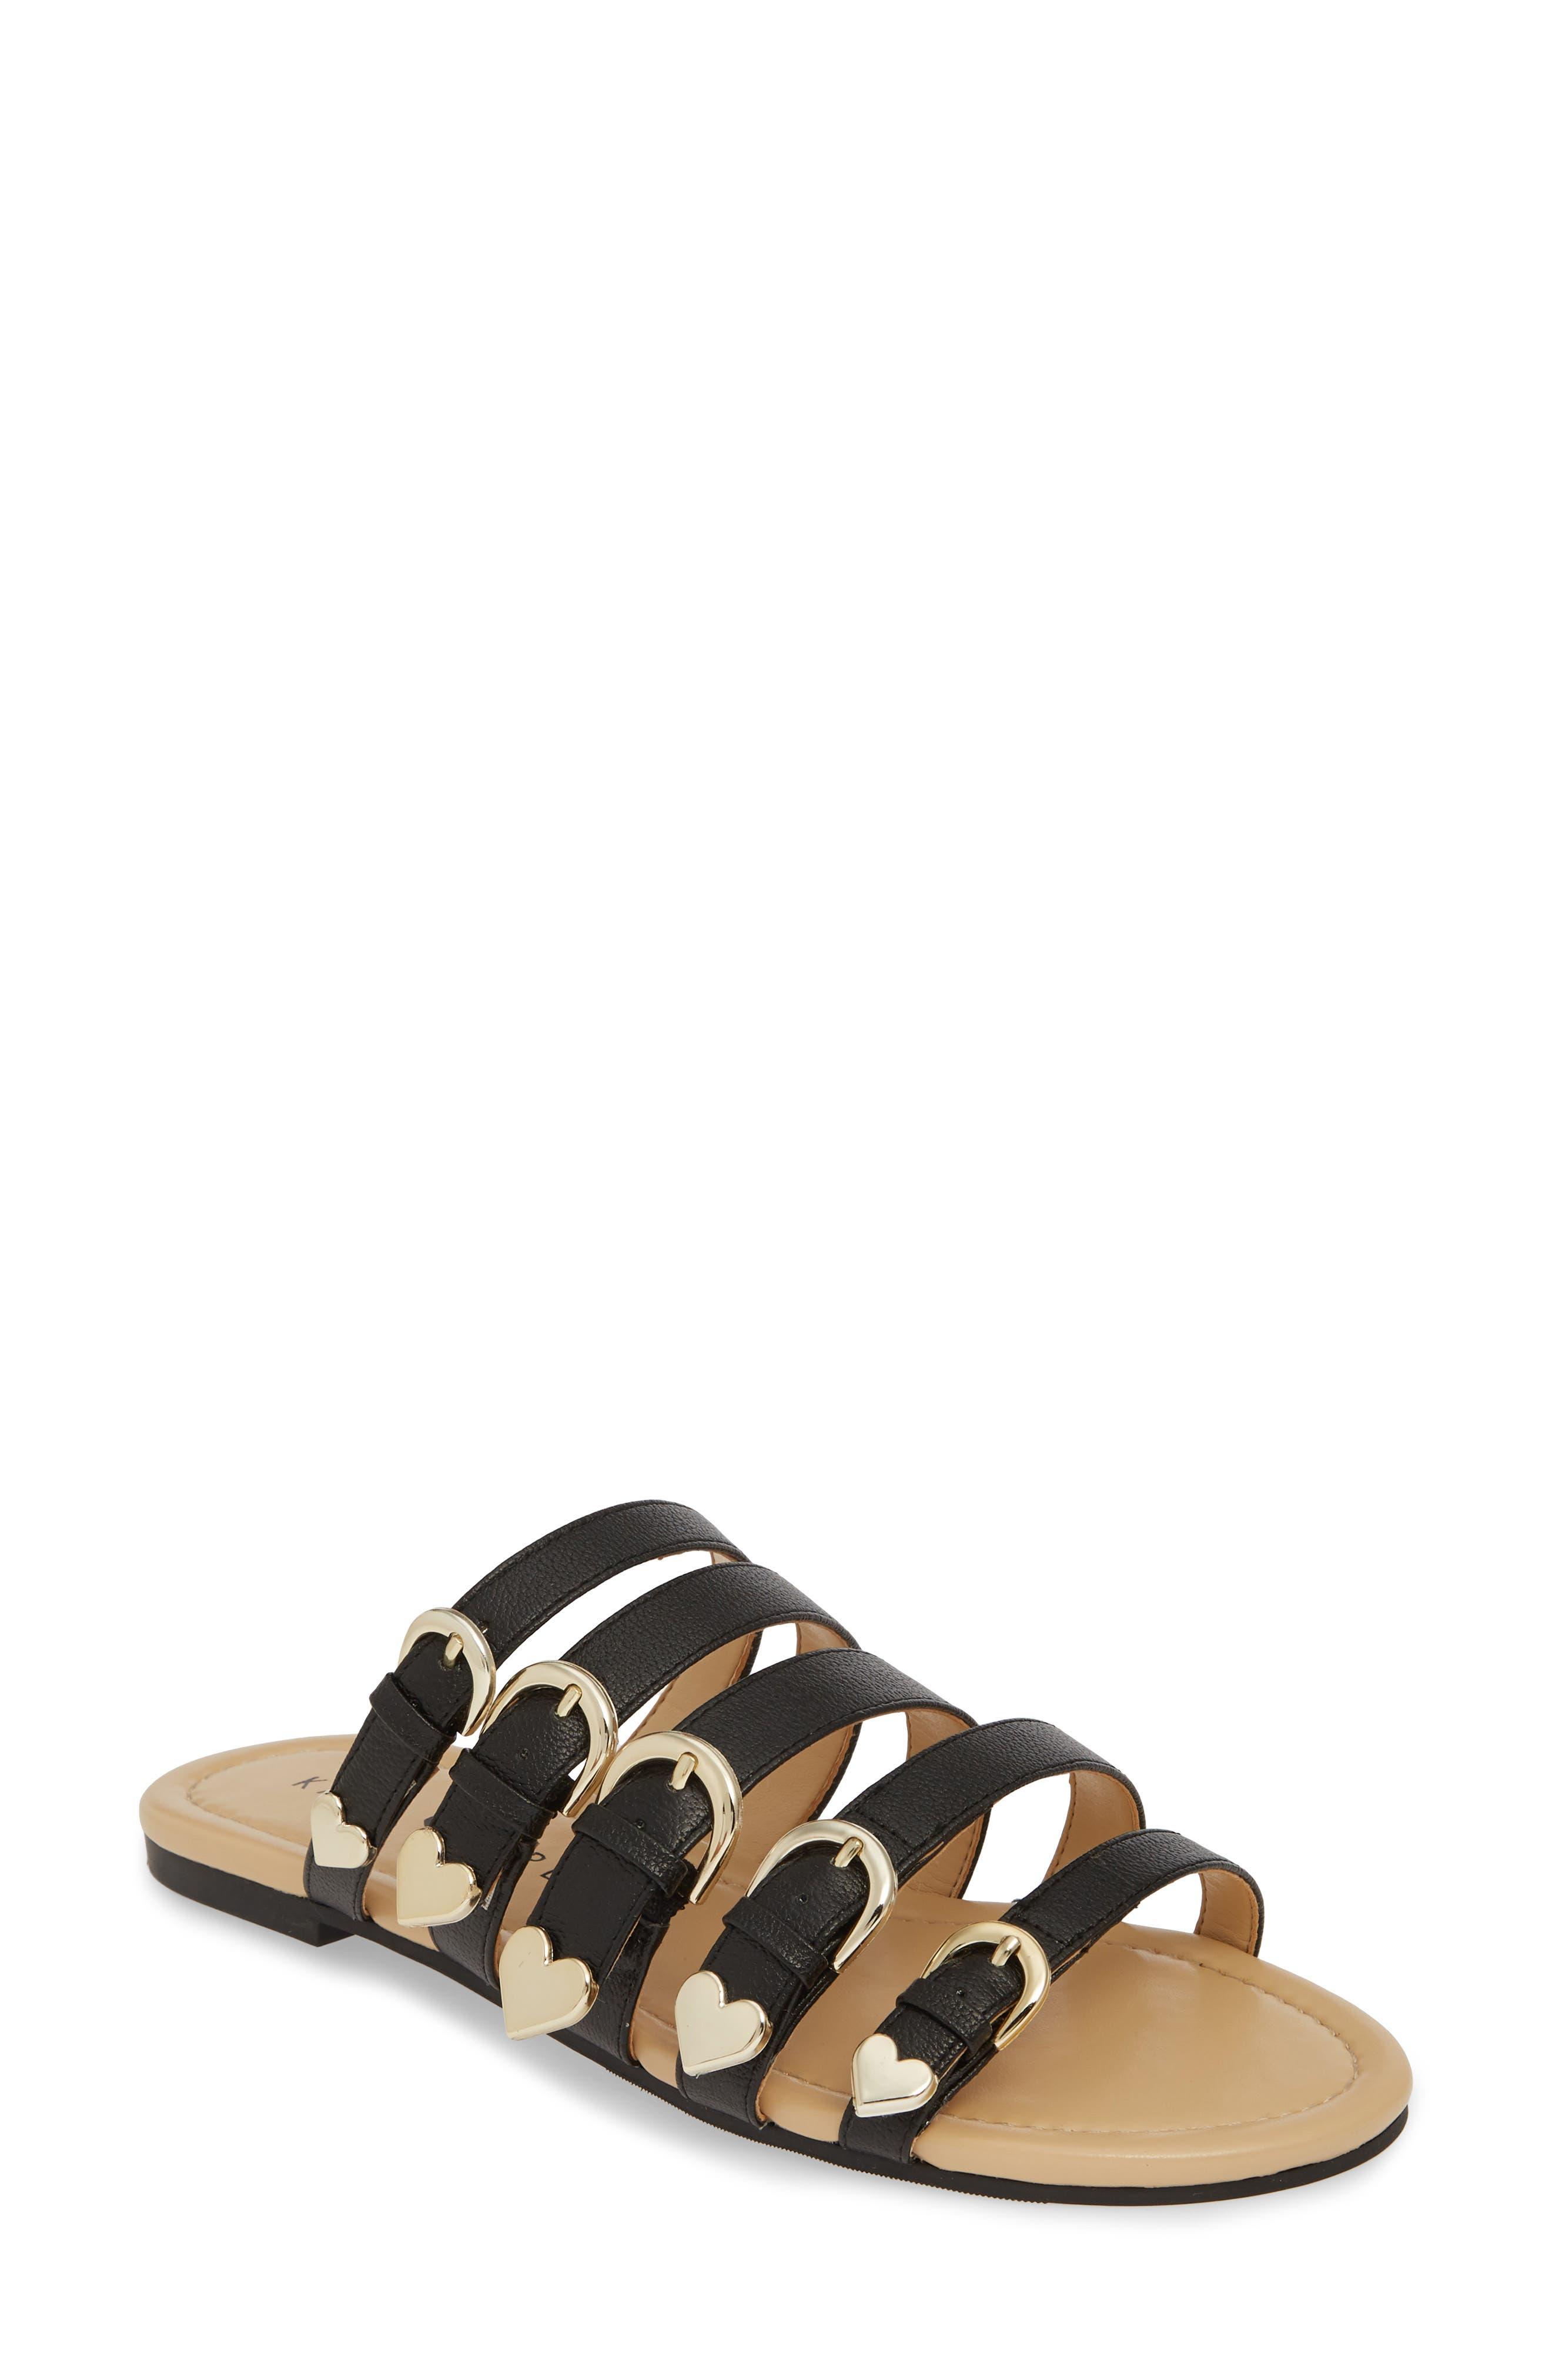 women's katy perry nikki flat slide sandal, size 9.5 m - black